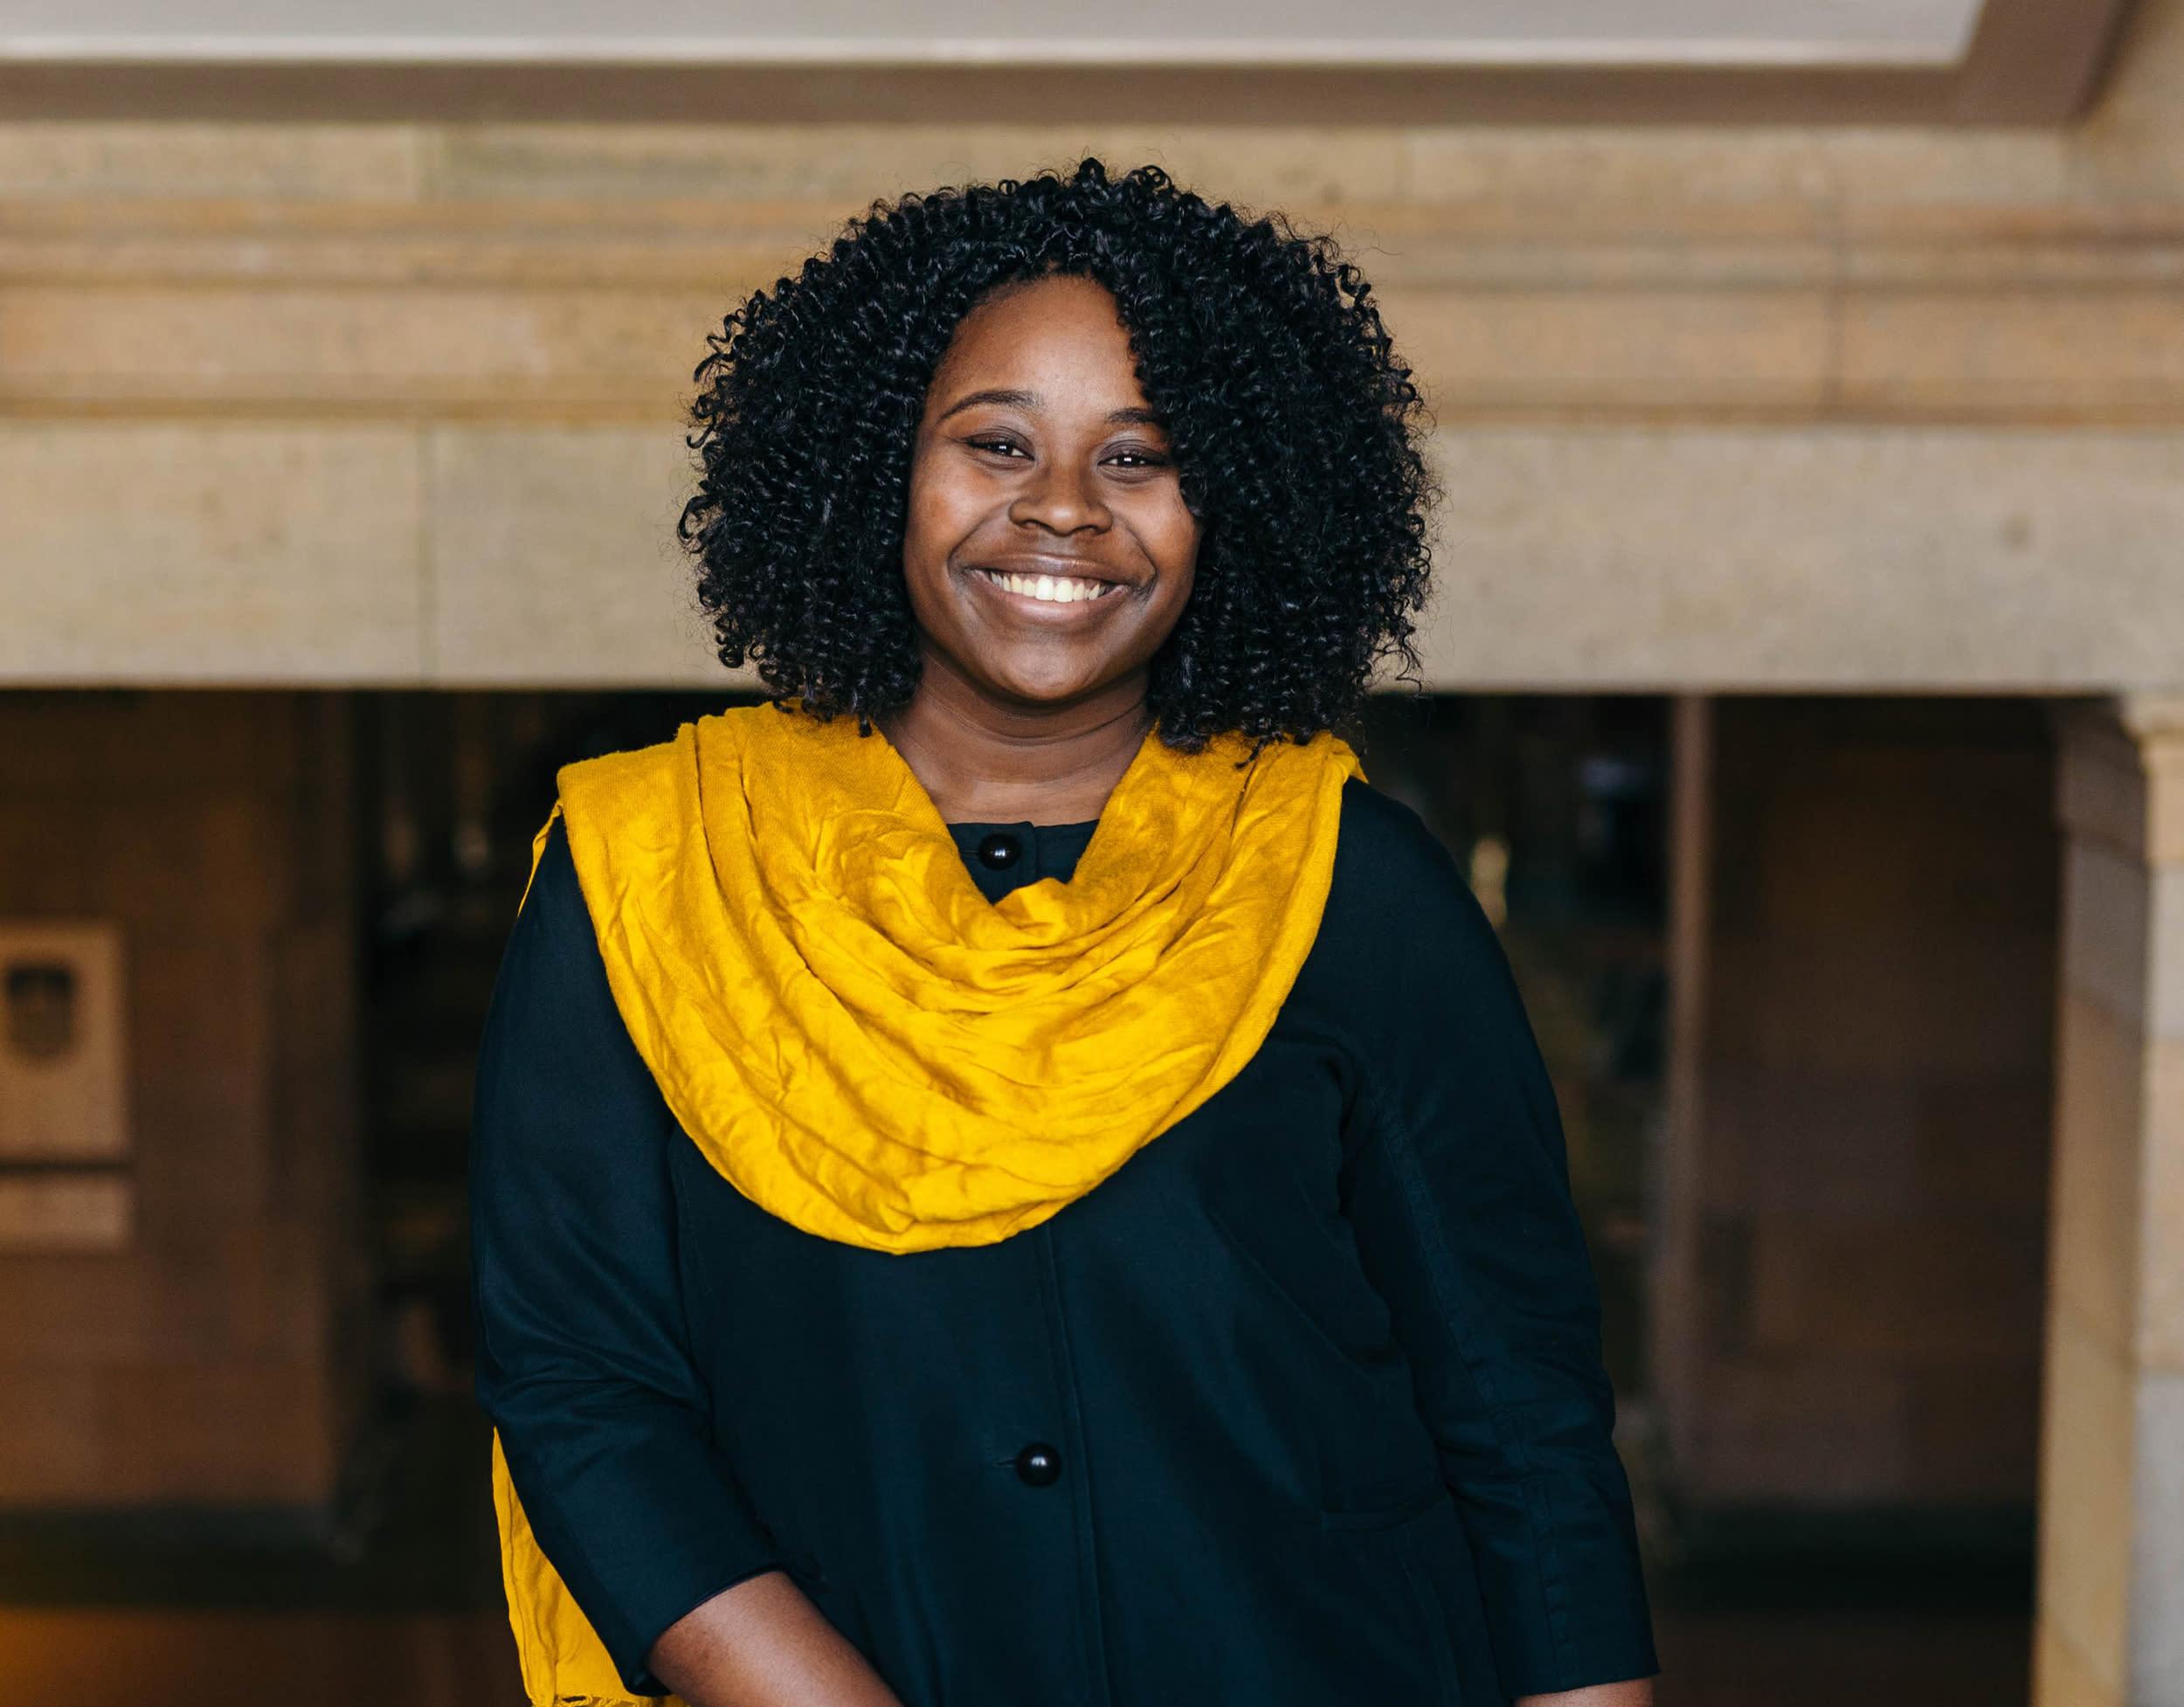 Meet Jael Kerandi, the student leader pushing University of Minnesota to change its relationship with police